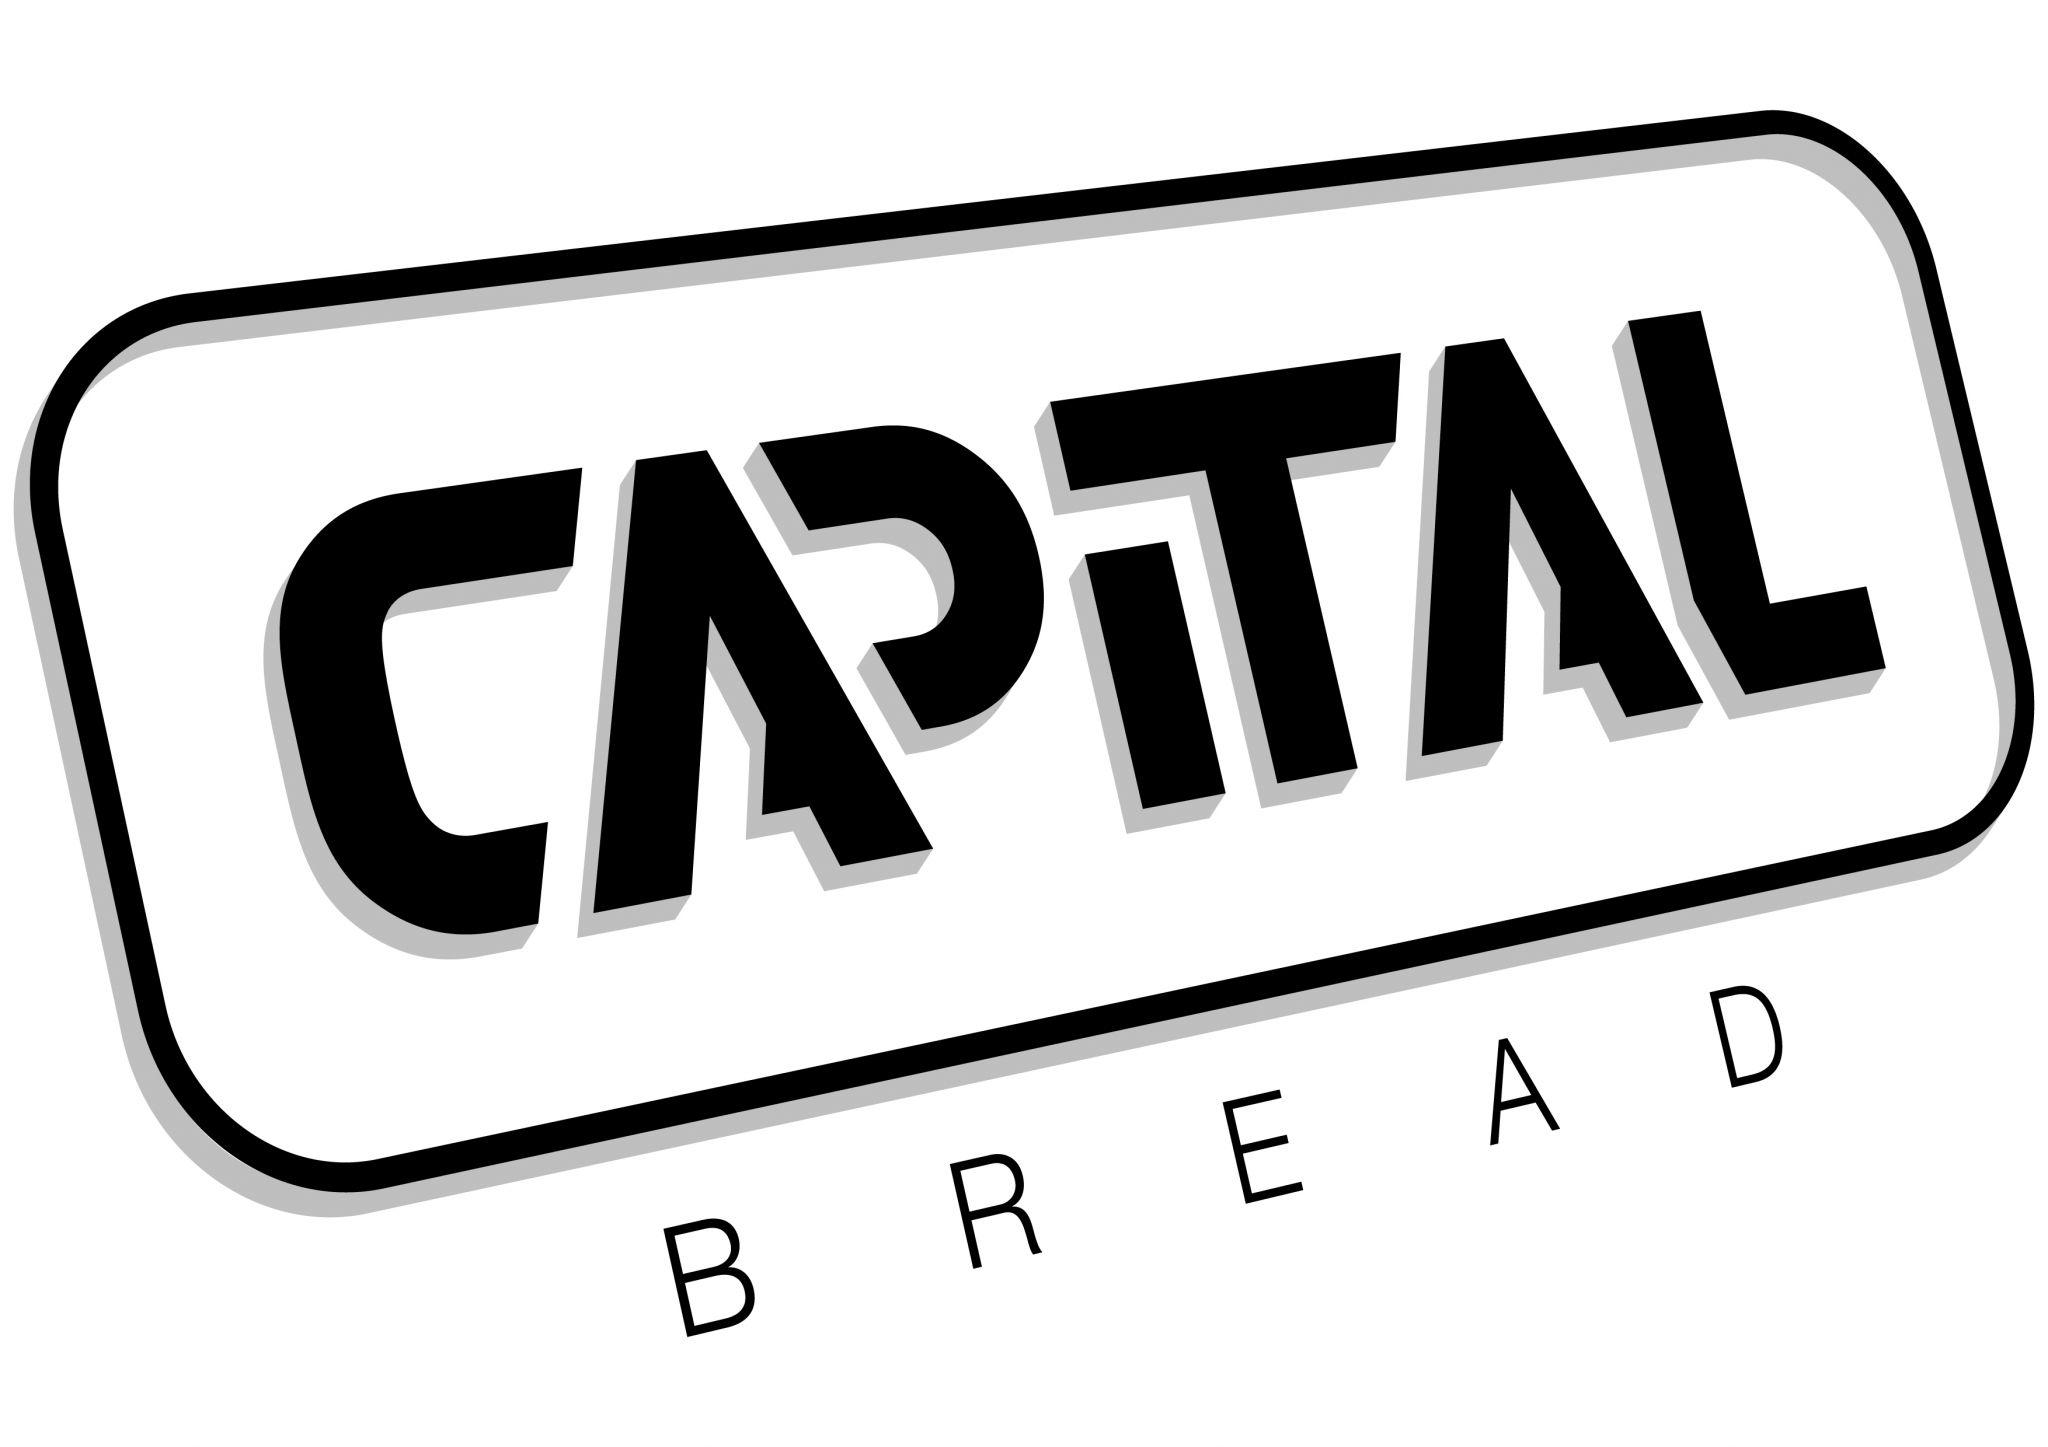 Capital Bread